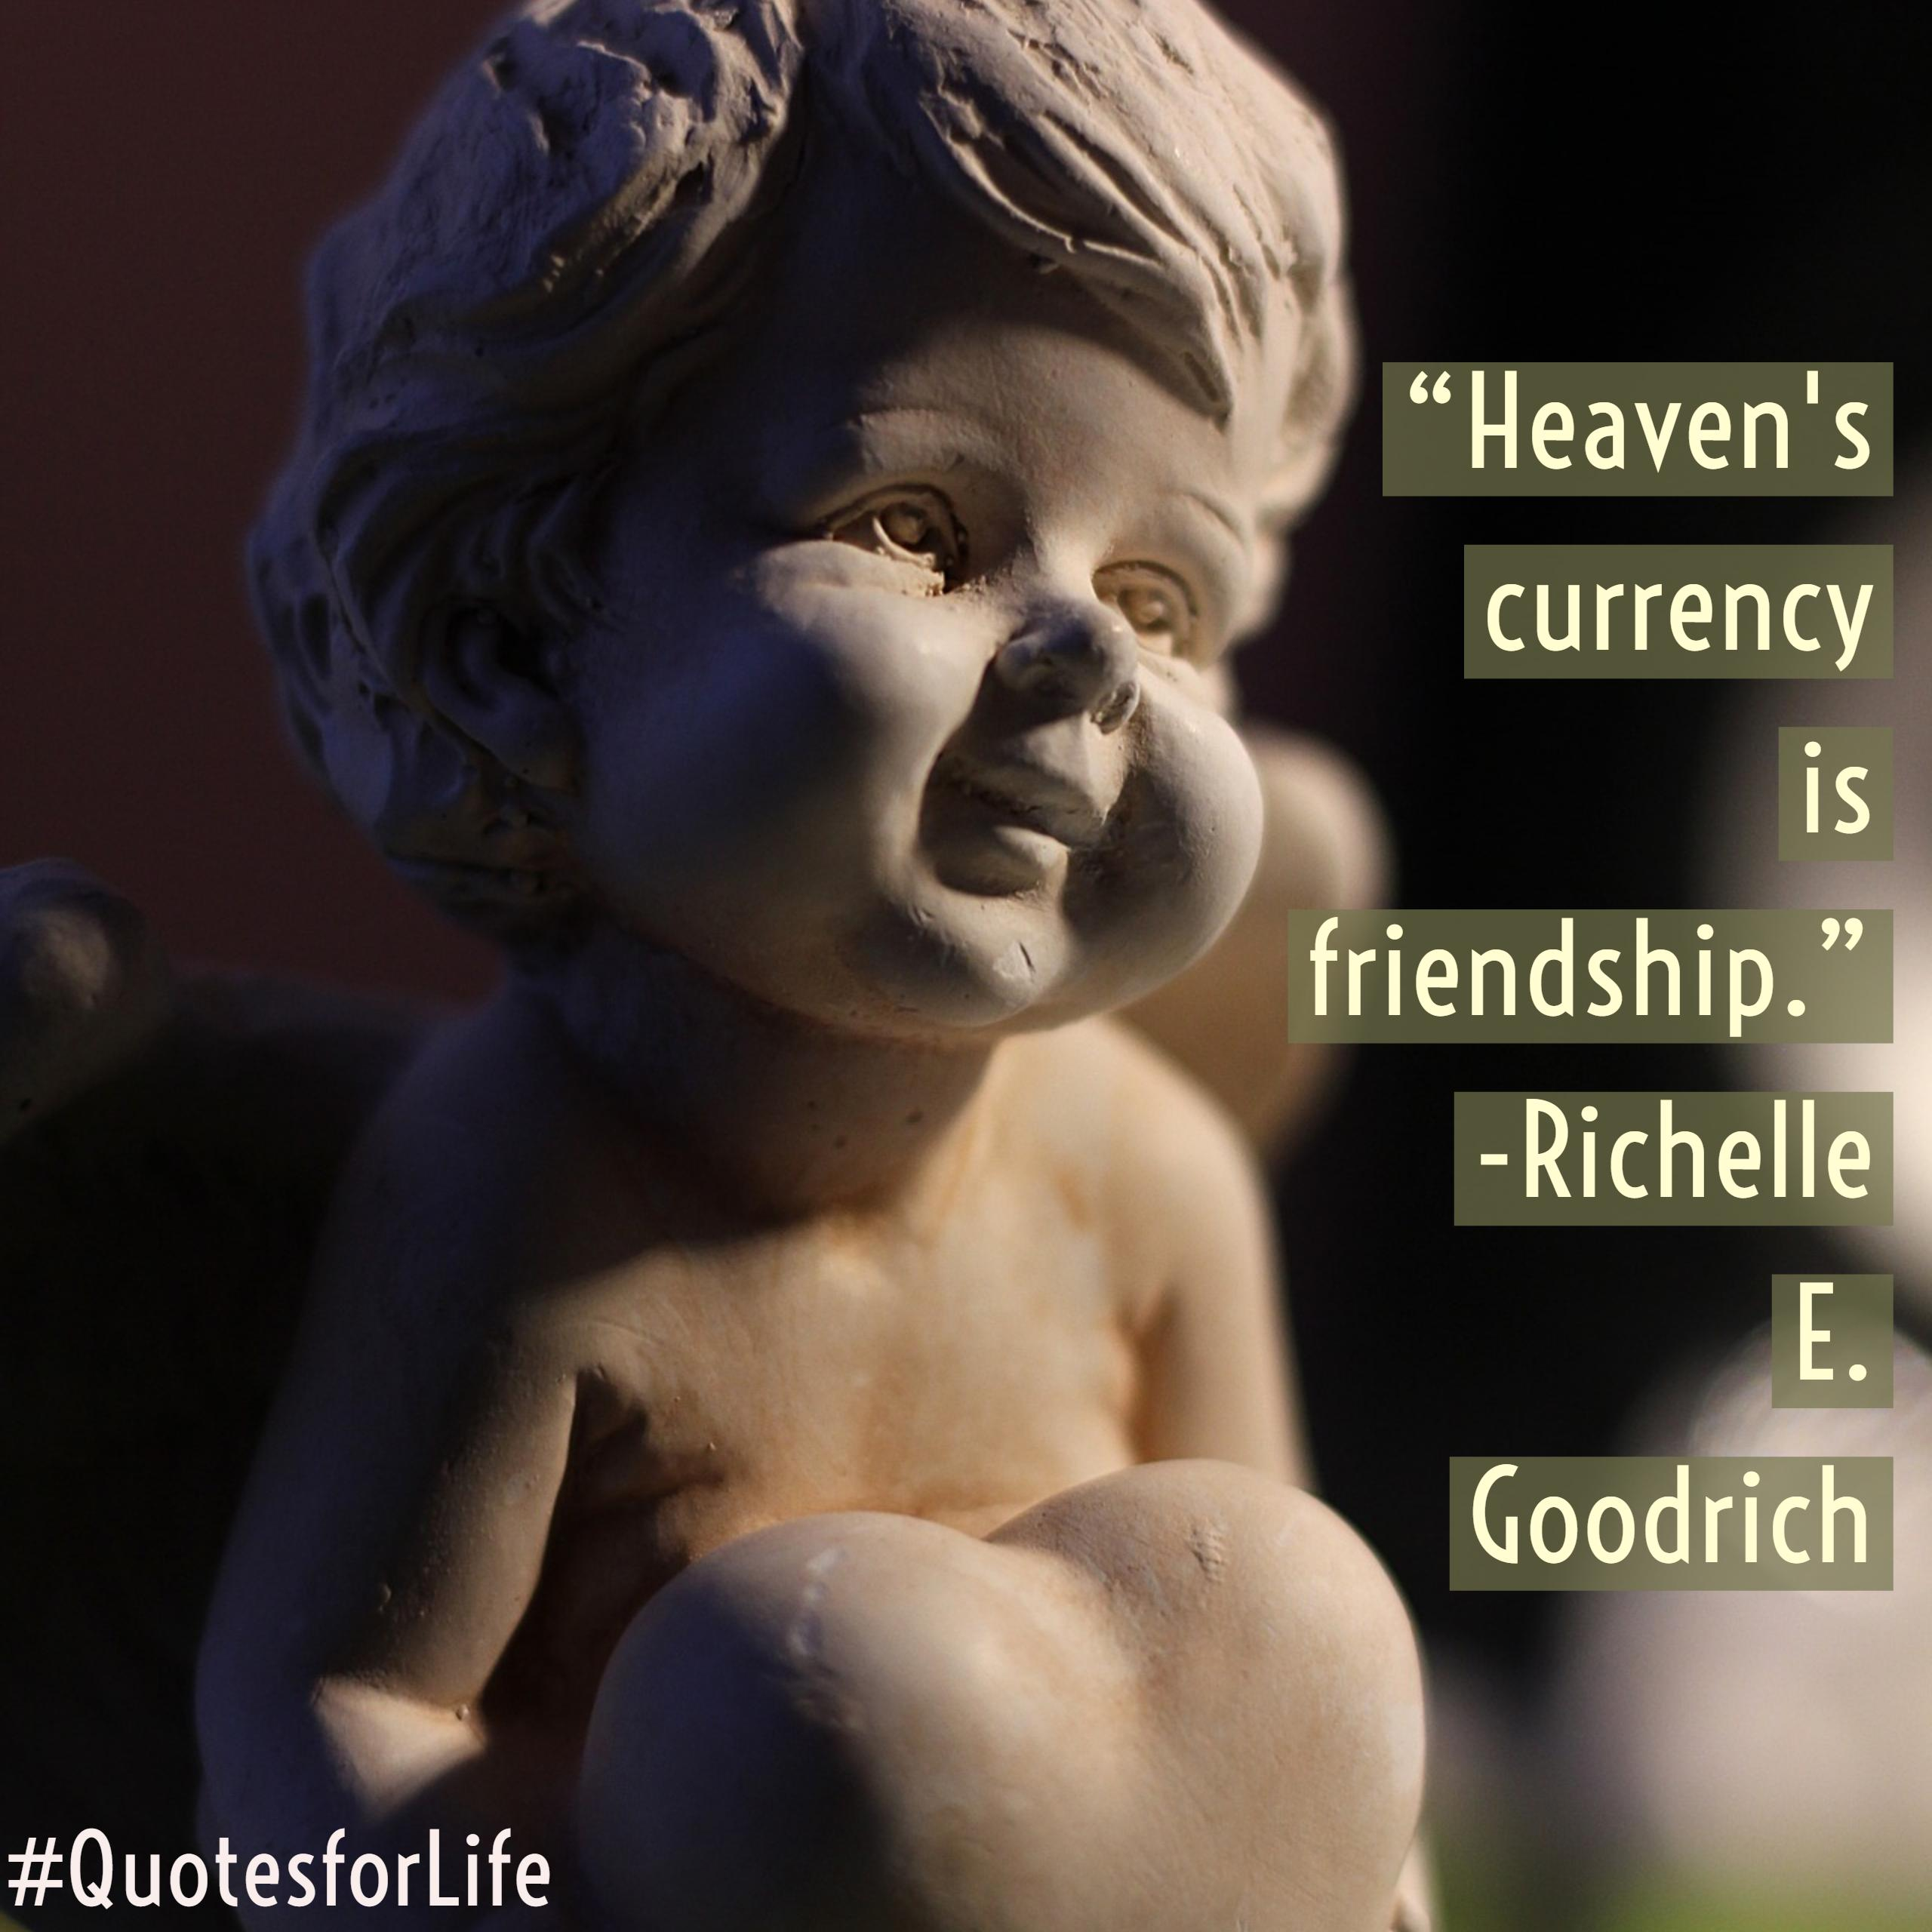 Richelle E. Goodrich